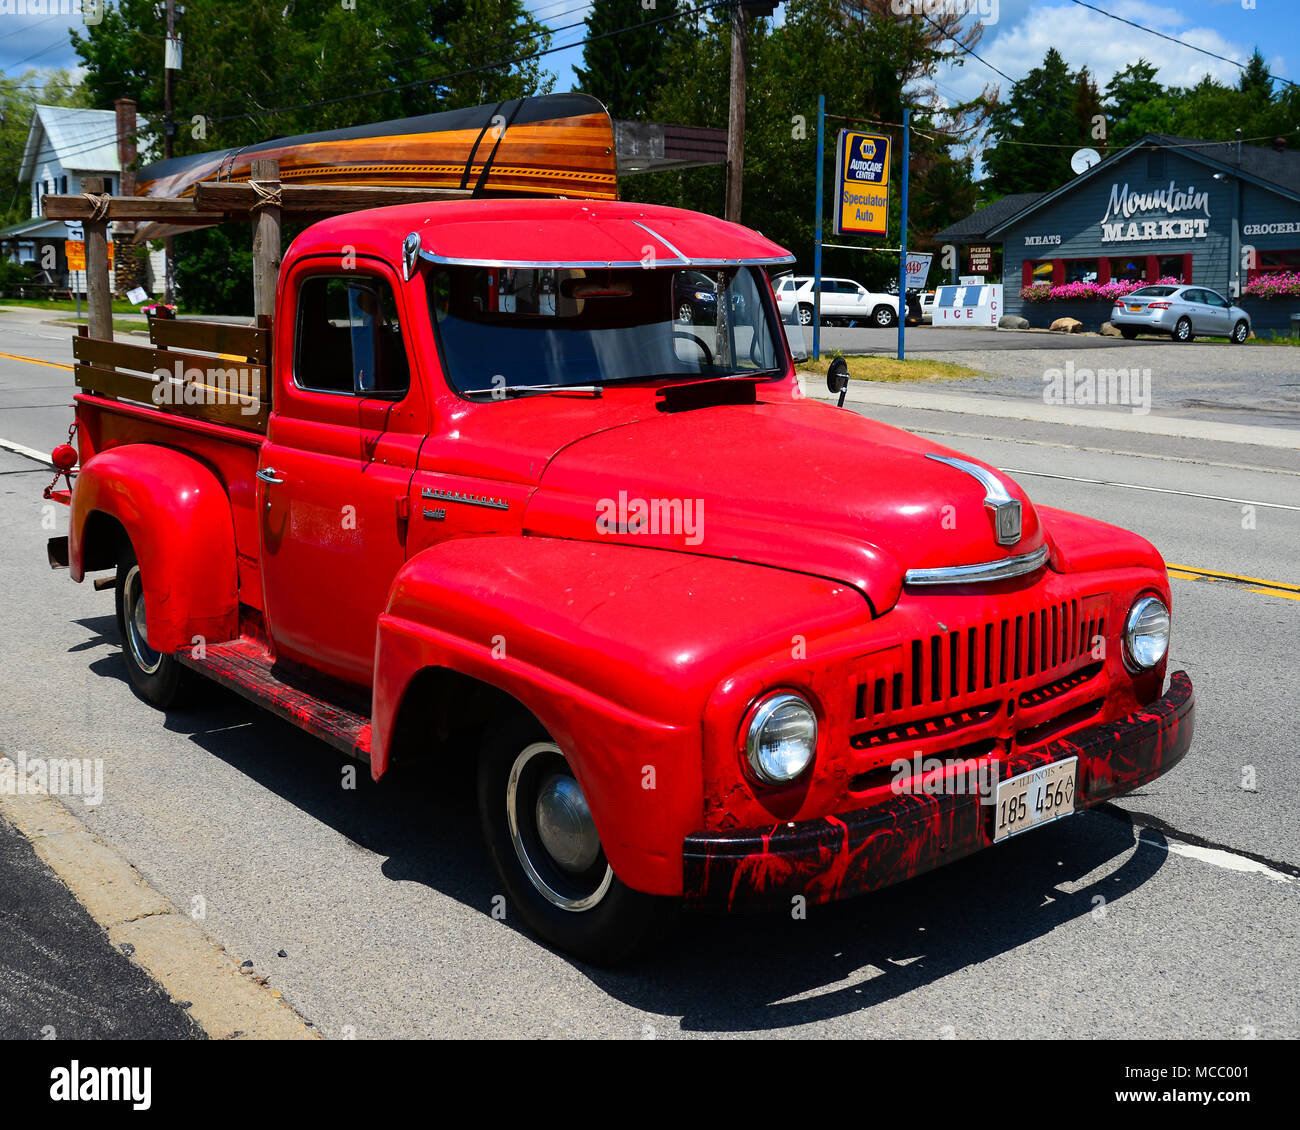 International Pickup Truck Stock Photos & International